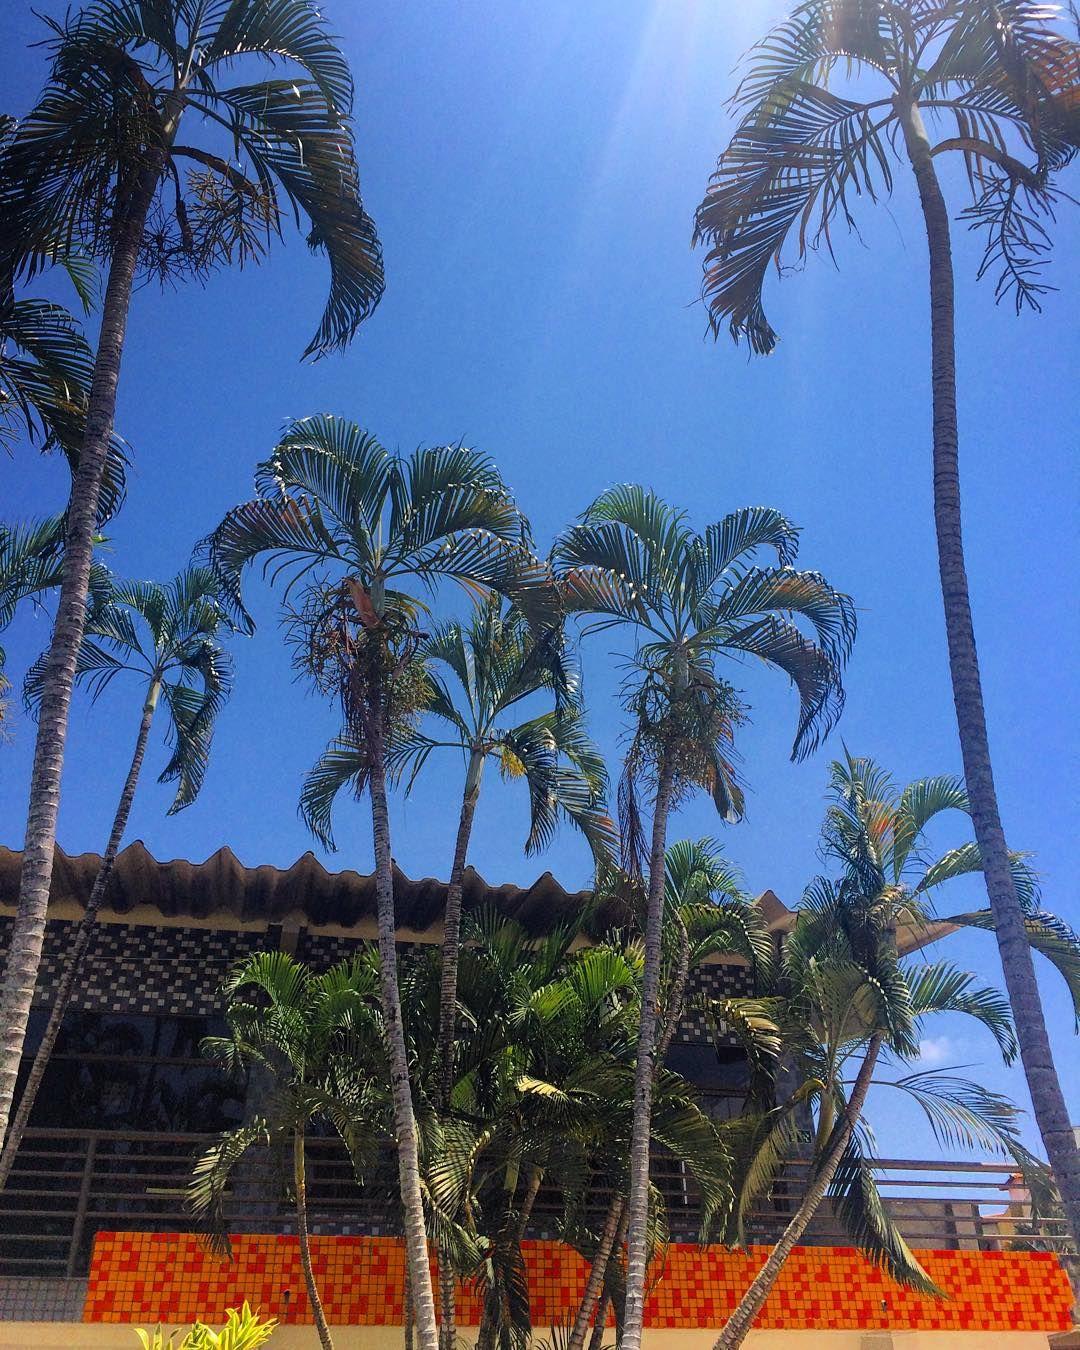 Viva Brasil #bestiestakebrazil #palmtrees #pictureperfect #tile #tileaddiction #filadelfia #governadorvaladares #minasgerais  #letthesunshine by alissajameson